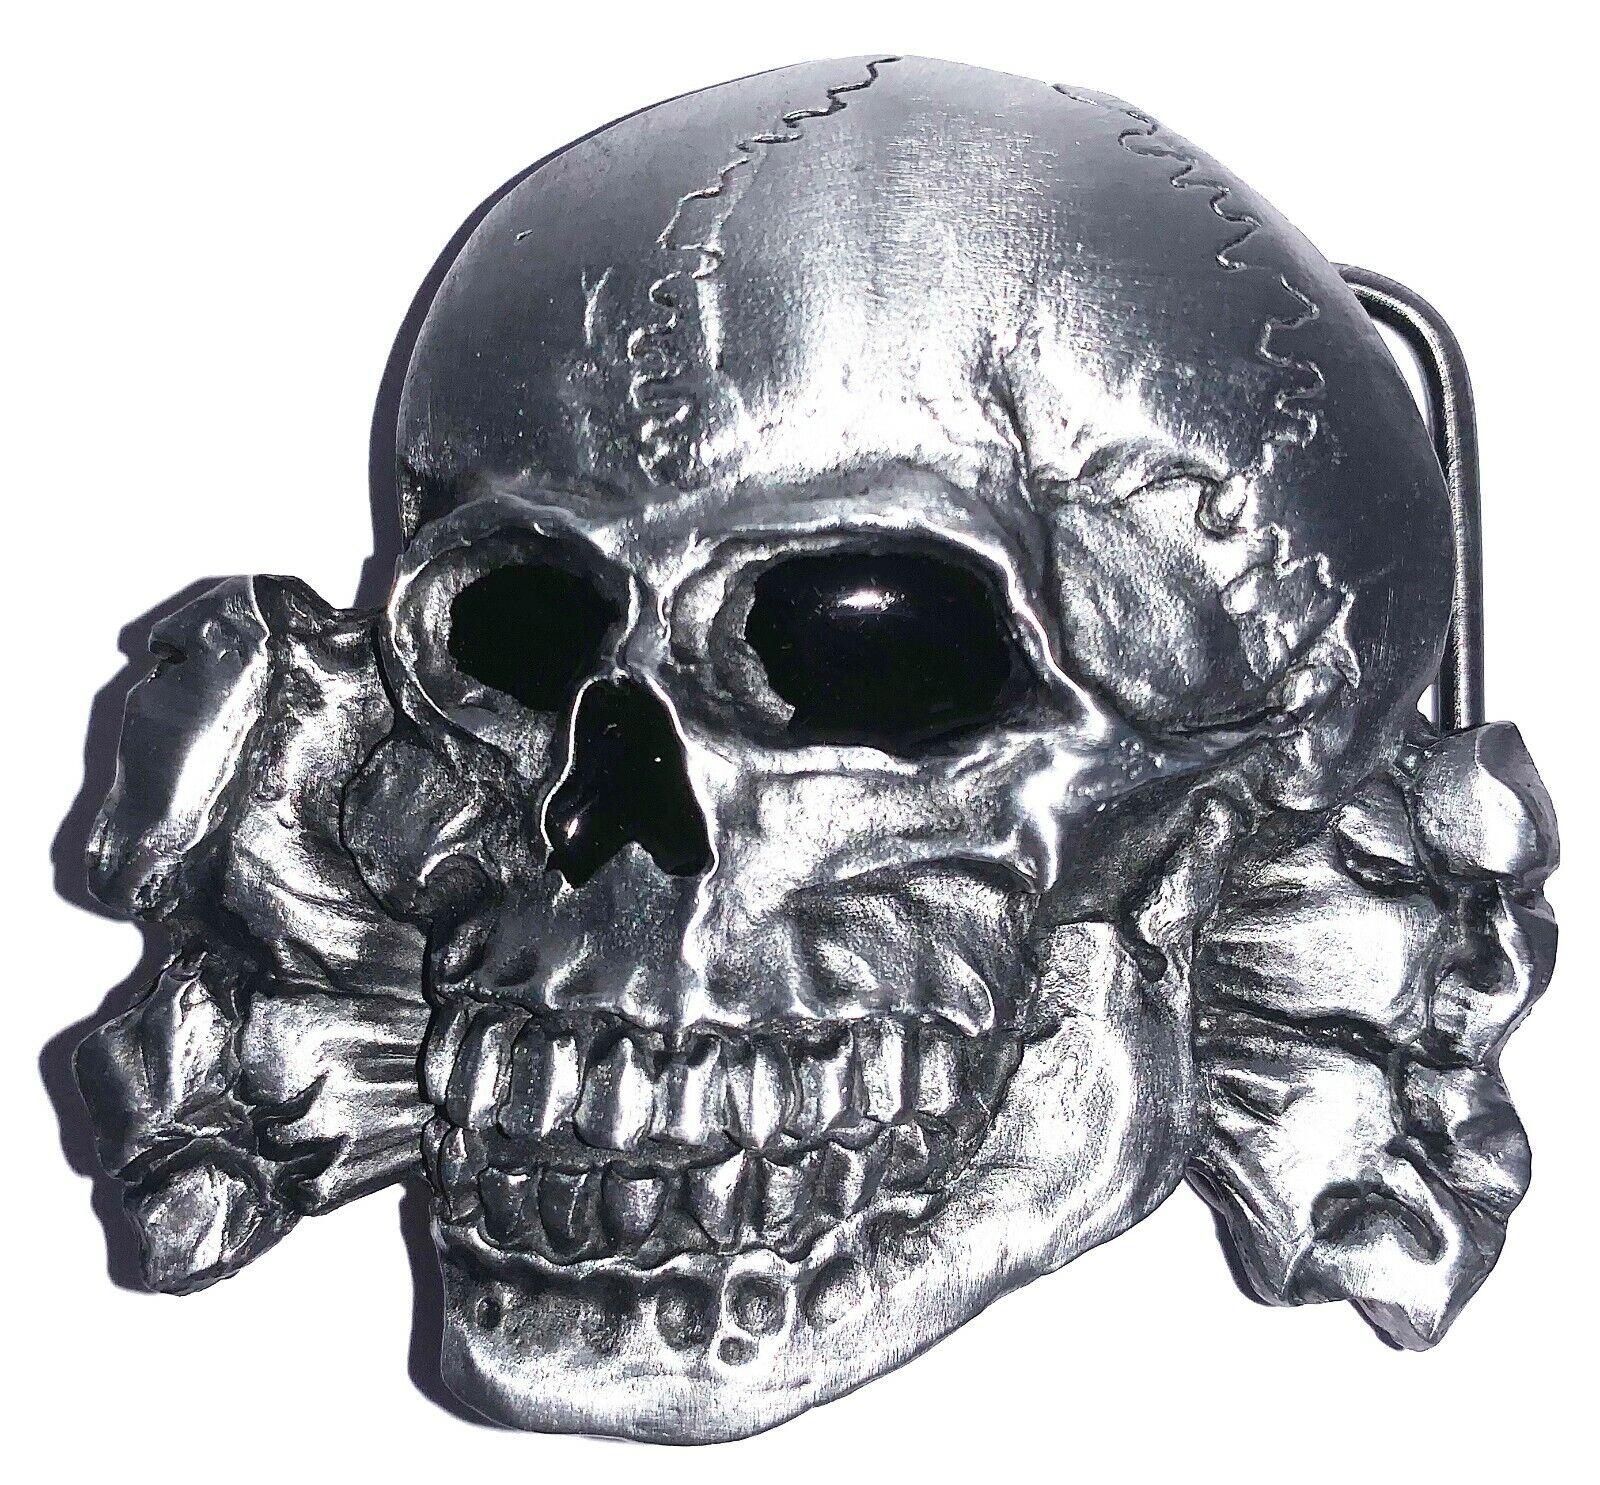 Belt Buckle SKULL AND BONES Gothic Horror by Dragon Designs